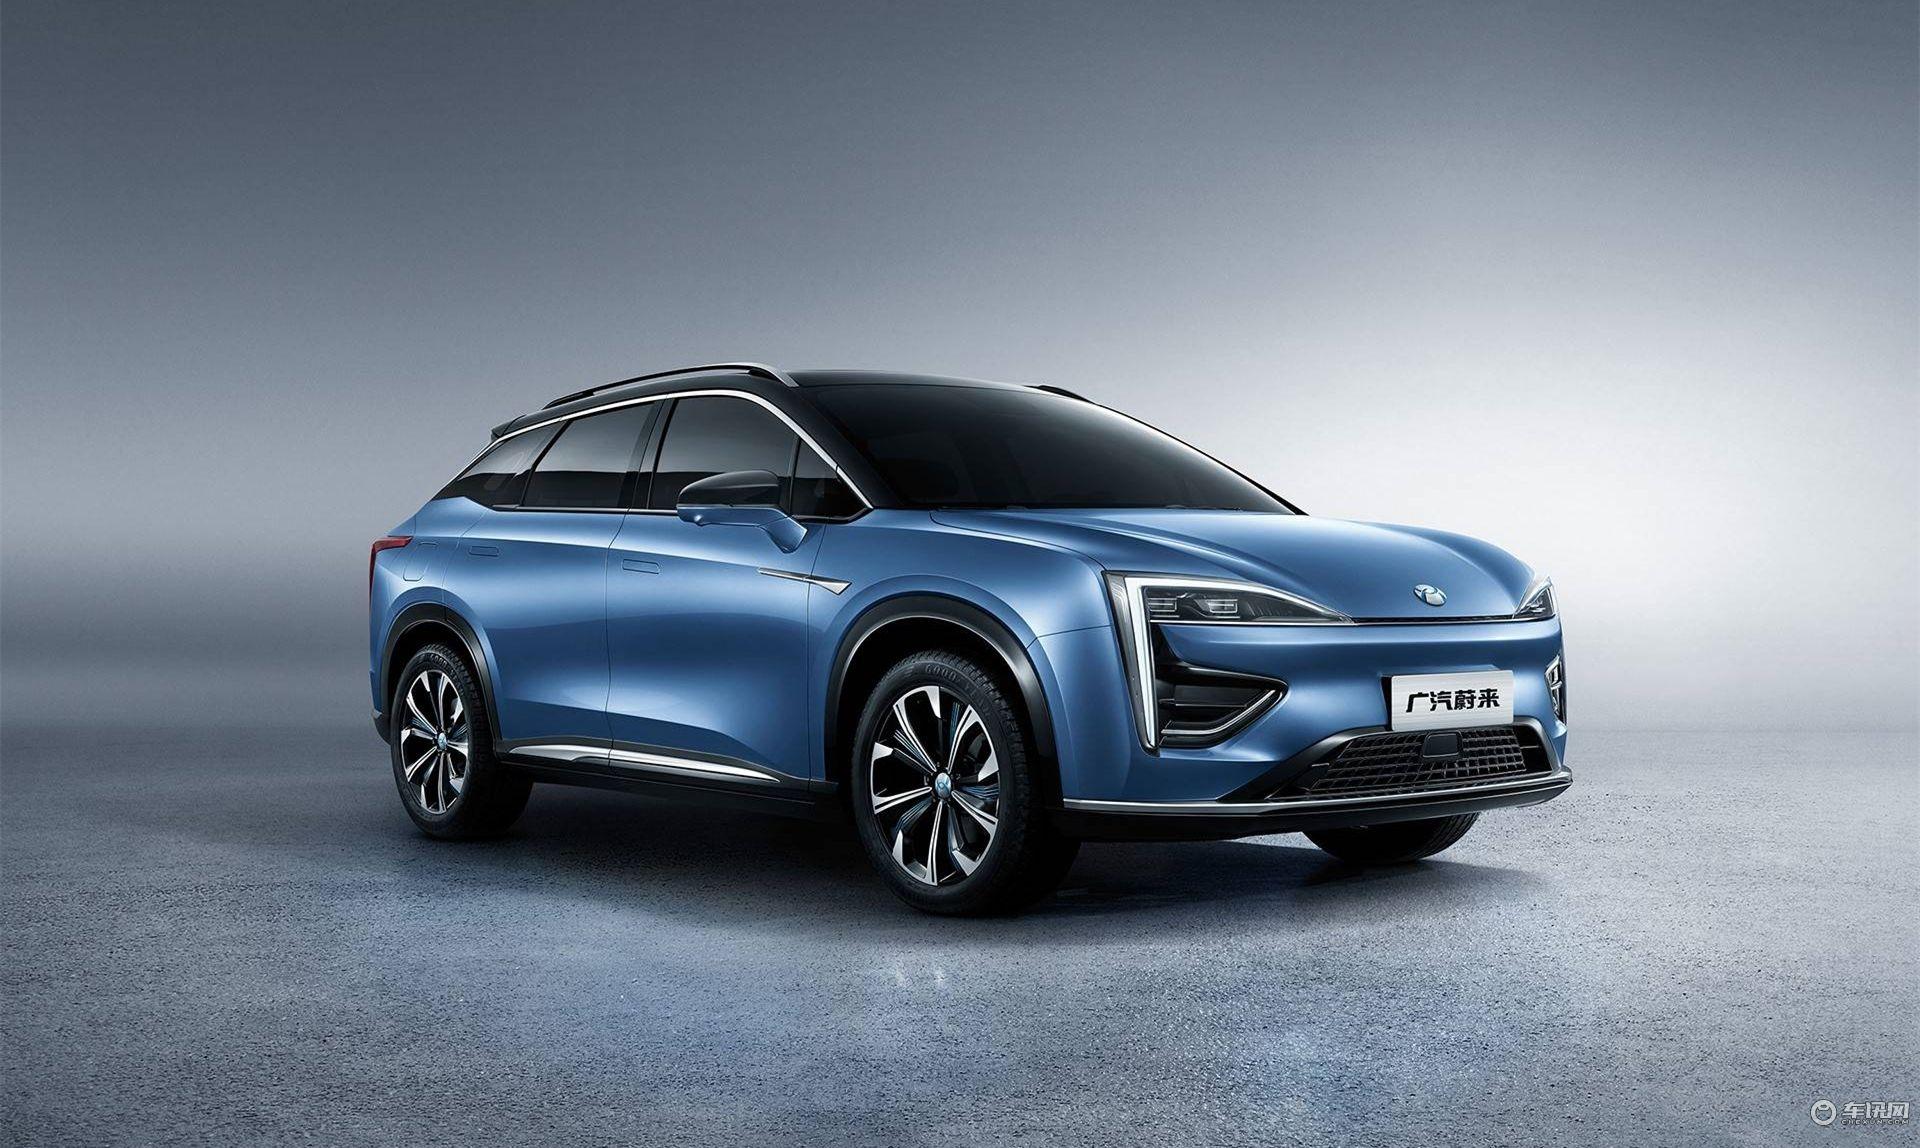 NEDC續航650km 廣汽蔚來首款車型將于12月27日發布